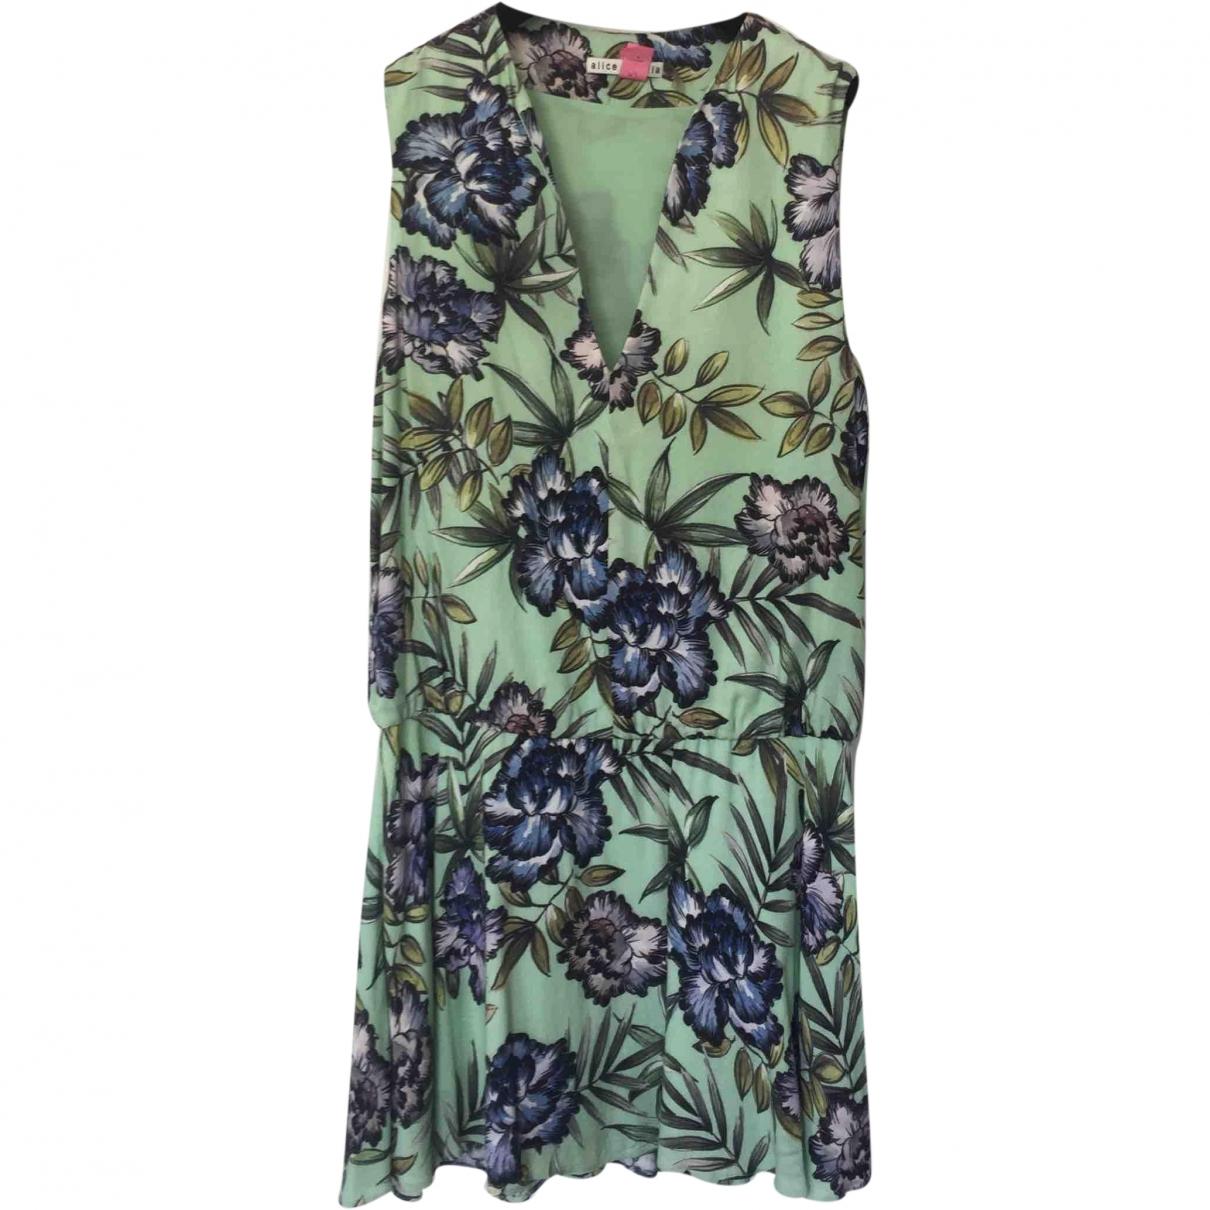 Alice & Olivia \N Green dress for Women 6 US